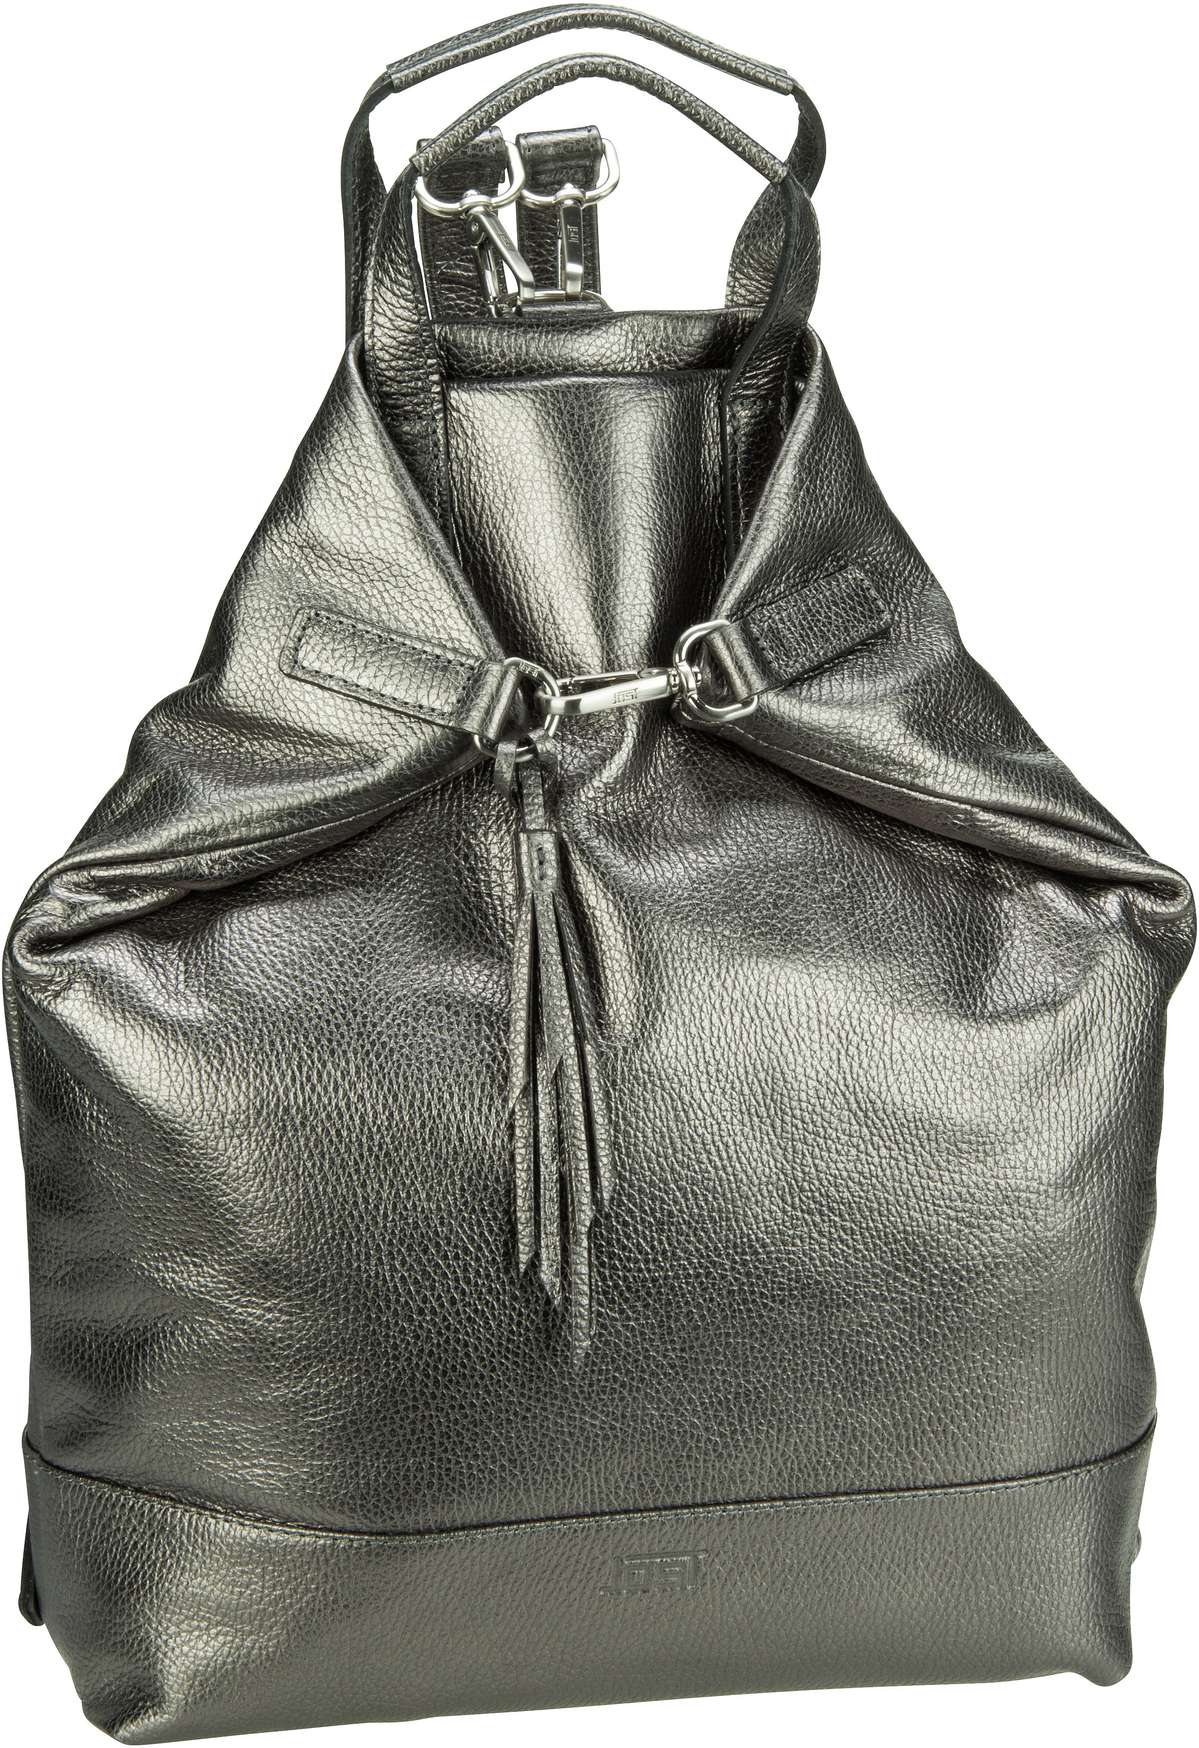 Rucksack / Daypack Vika 1910 X-Change 3in1 Bag S Silver